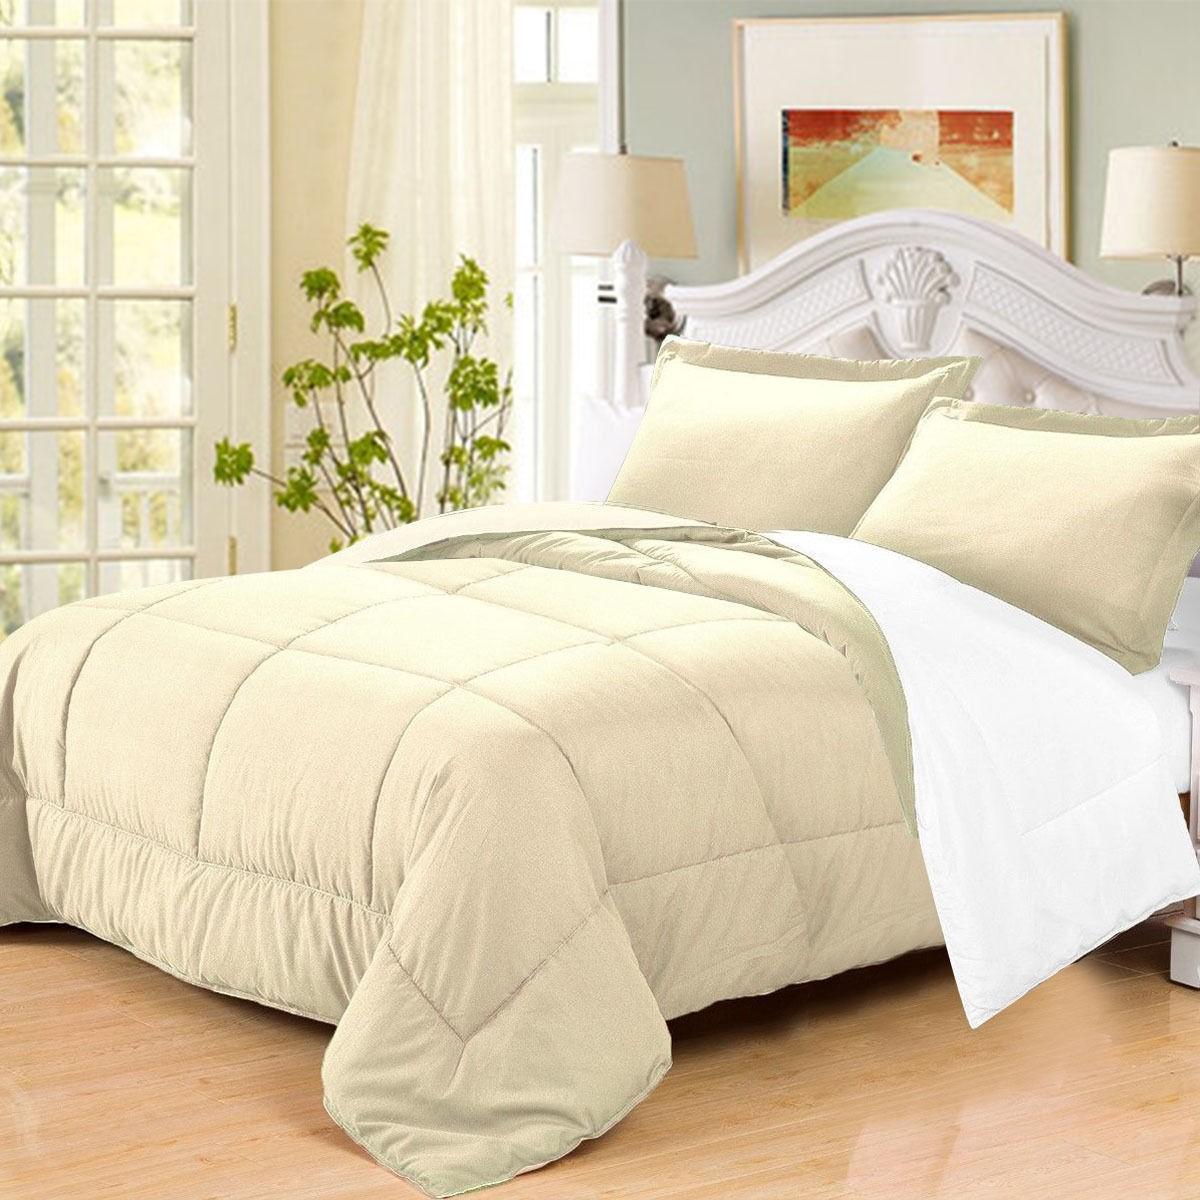 3 Pc Goose Down Alternative Reversible Comforter Sham